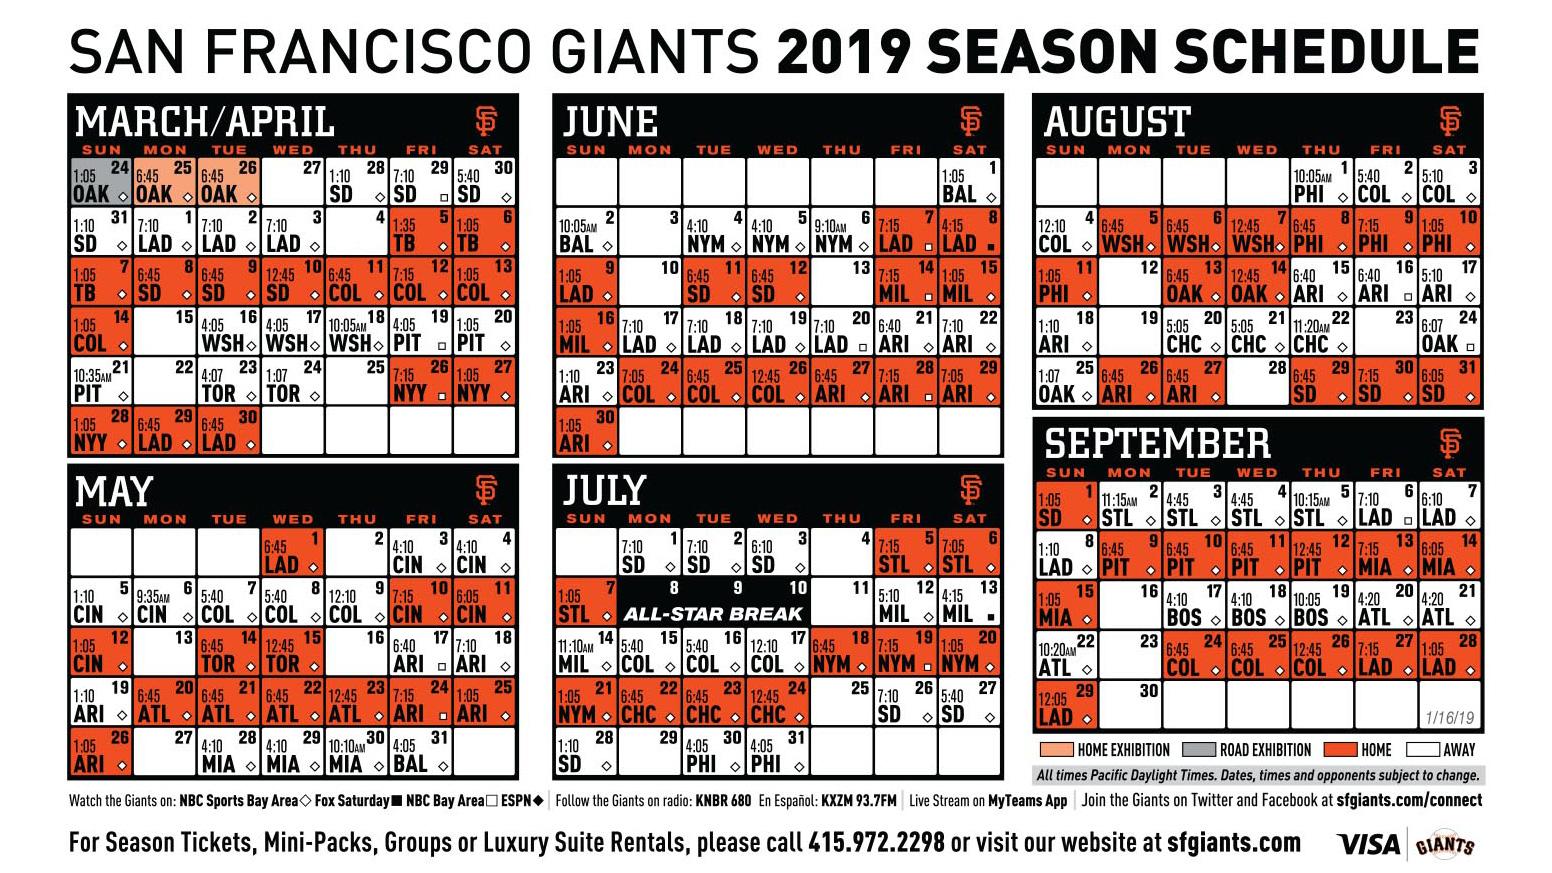 Mets 2018 Schedule Pdf